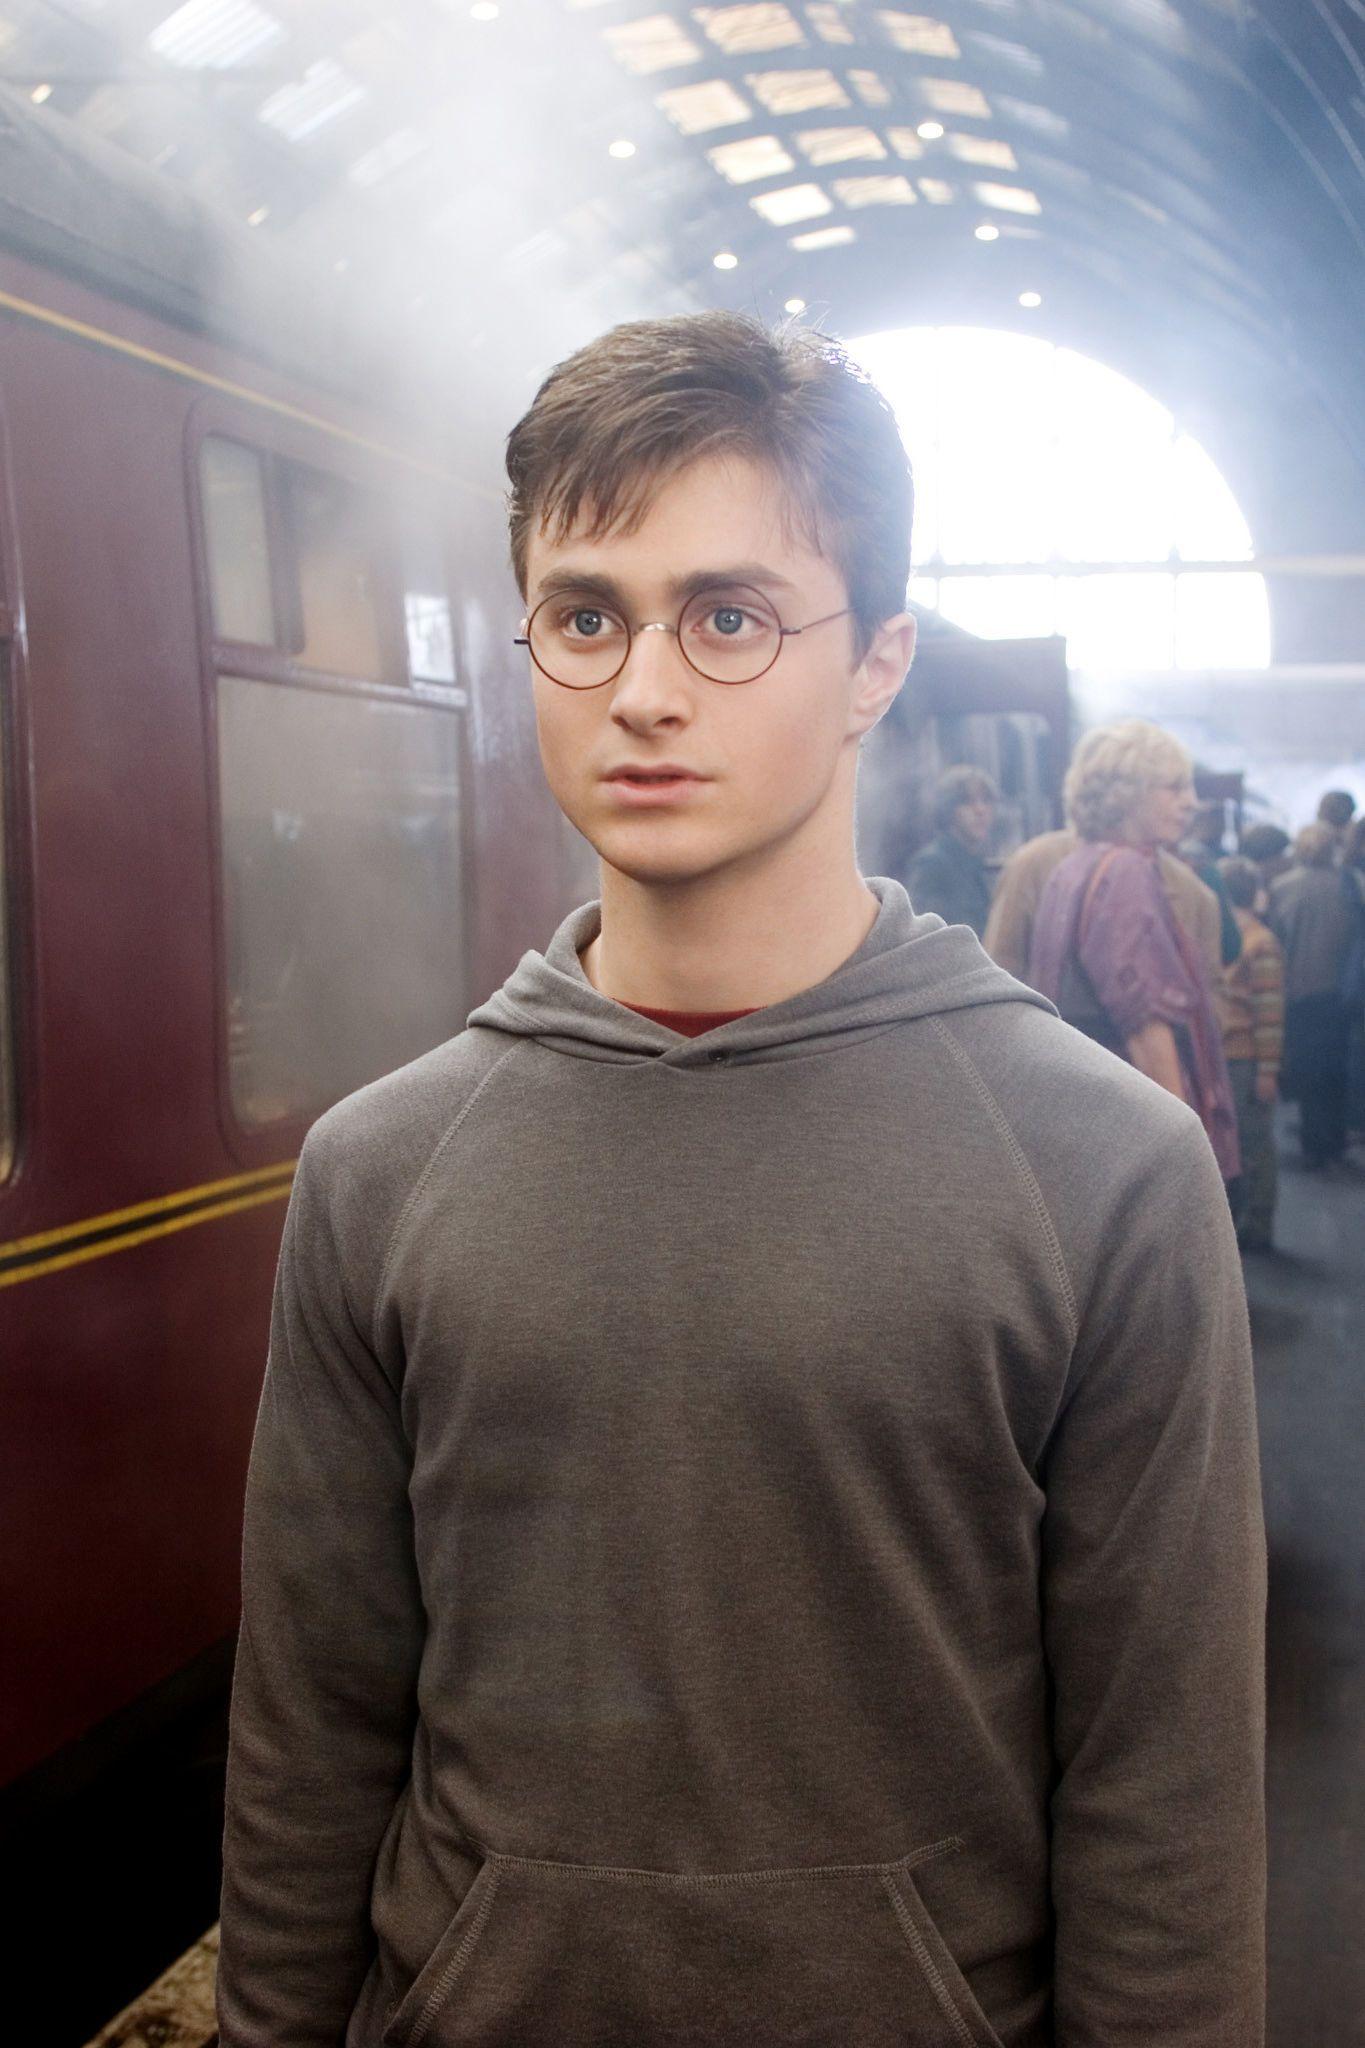 Harry Potter Im Echten Leben Wo Finde Ich Gleis 9 3 4 Harry Potter Scar Daniel Radcliffe Harry Potter Young Harry Potter